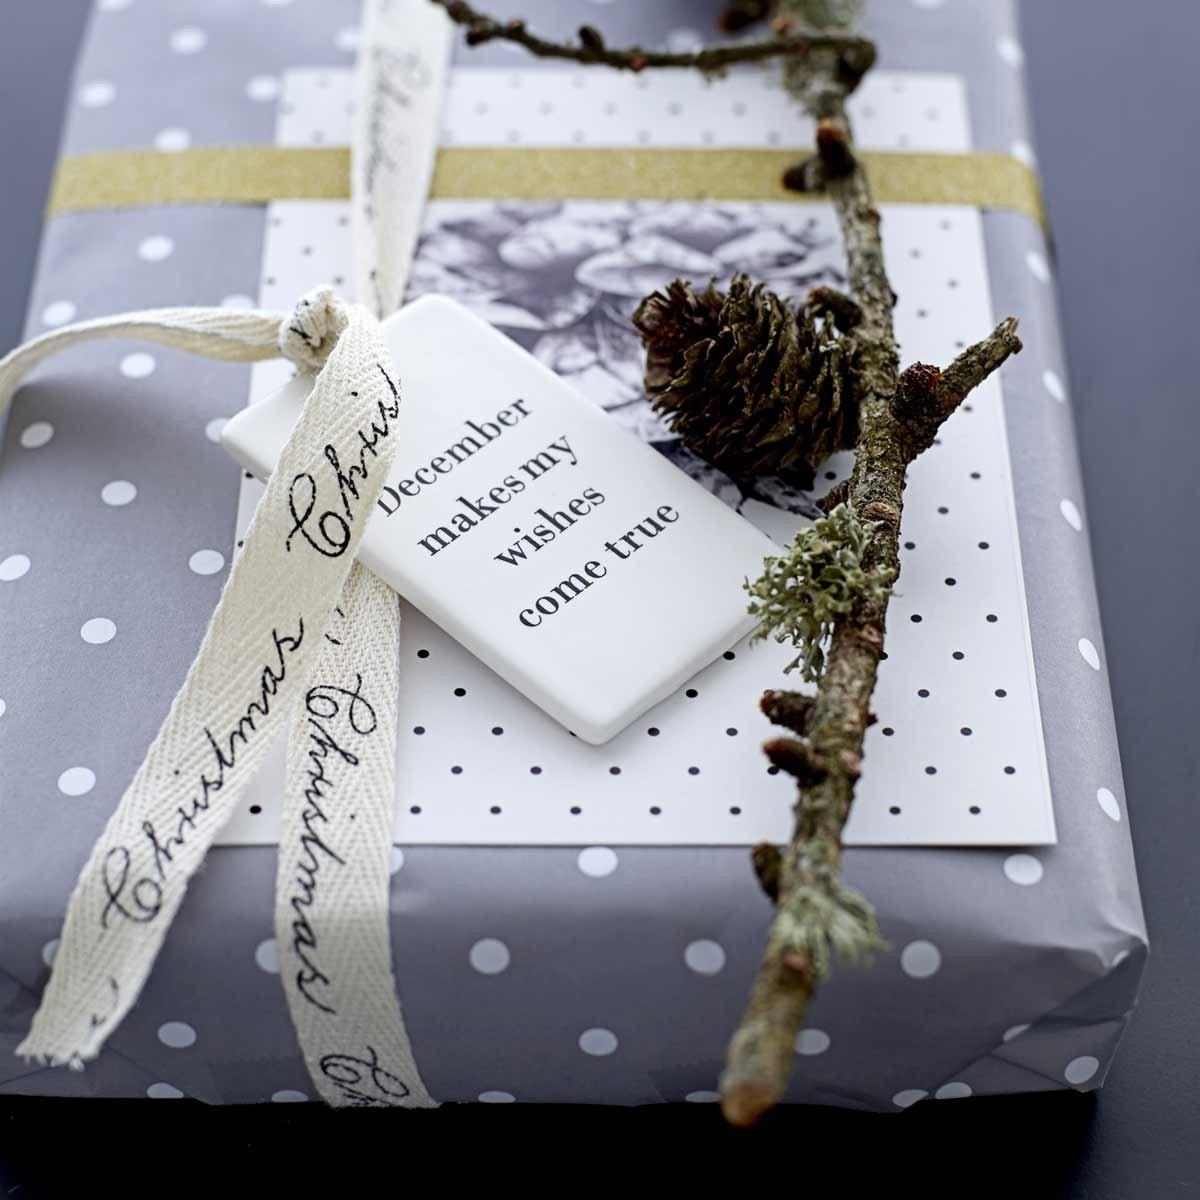 carte regalo speciali